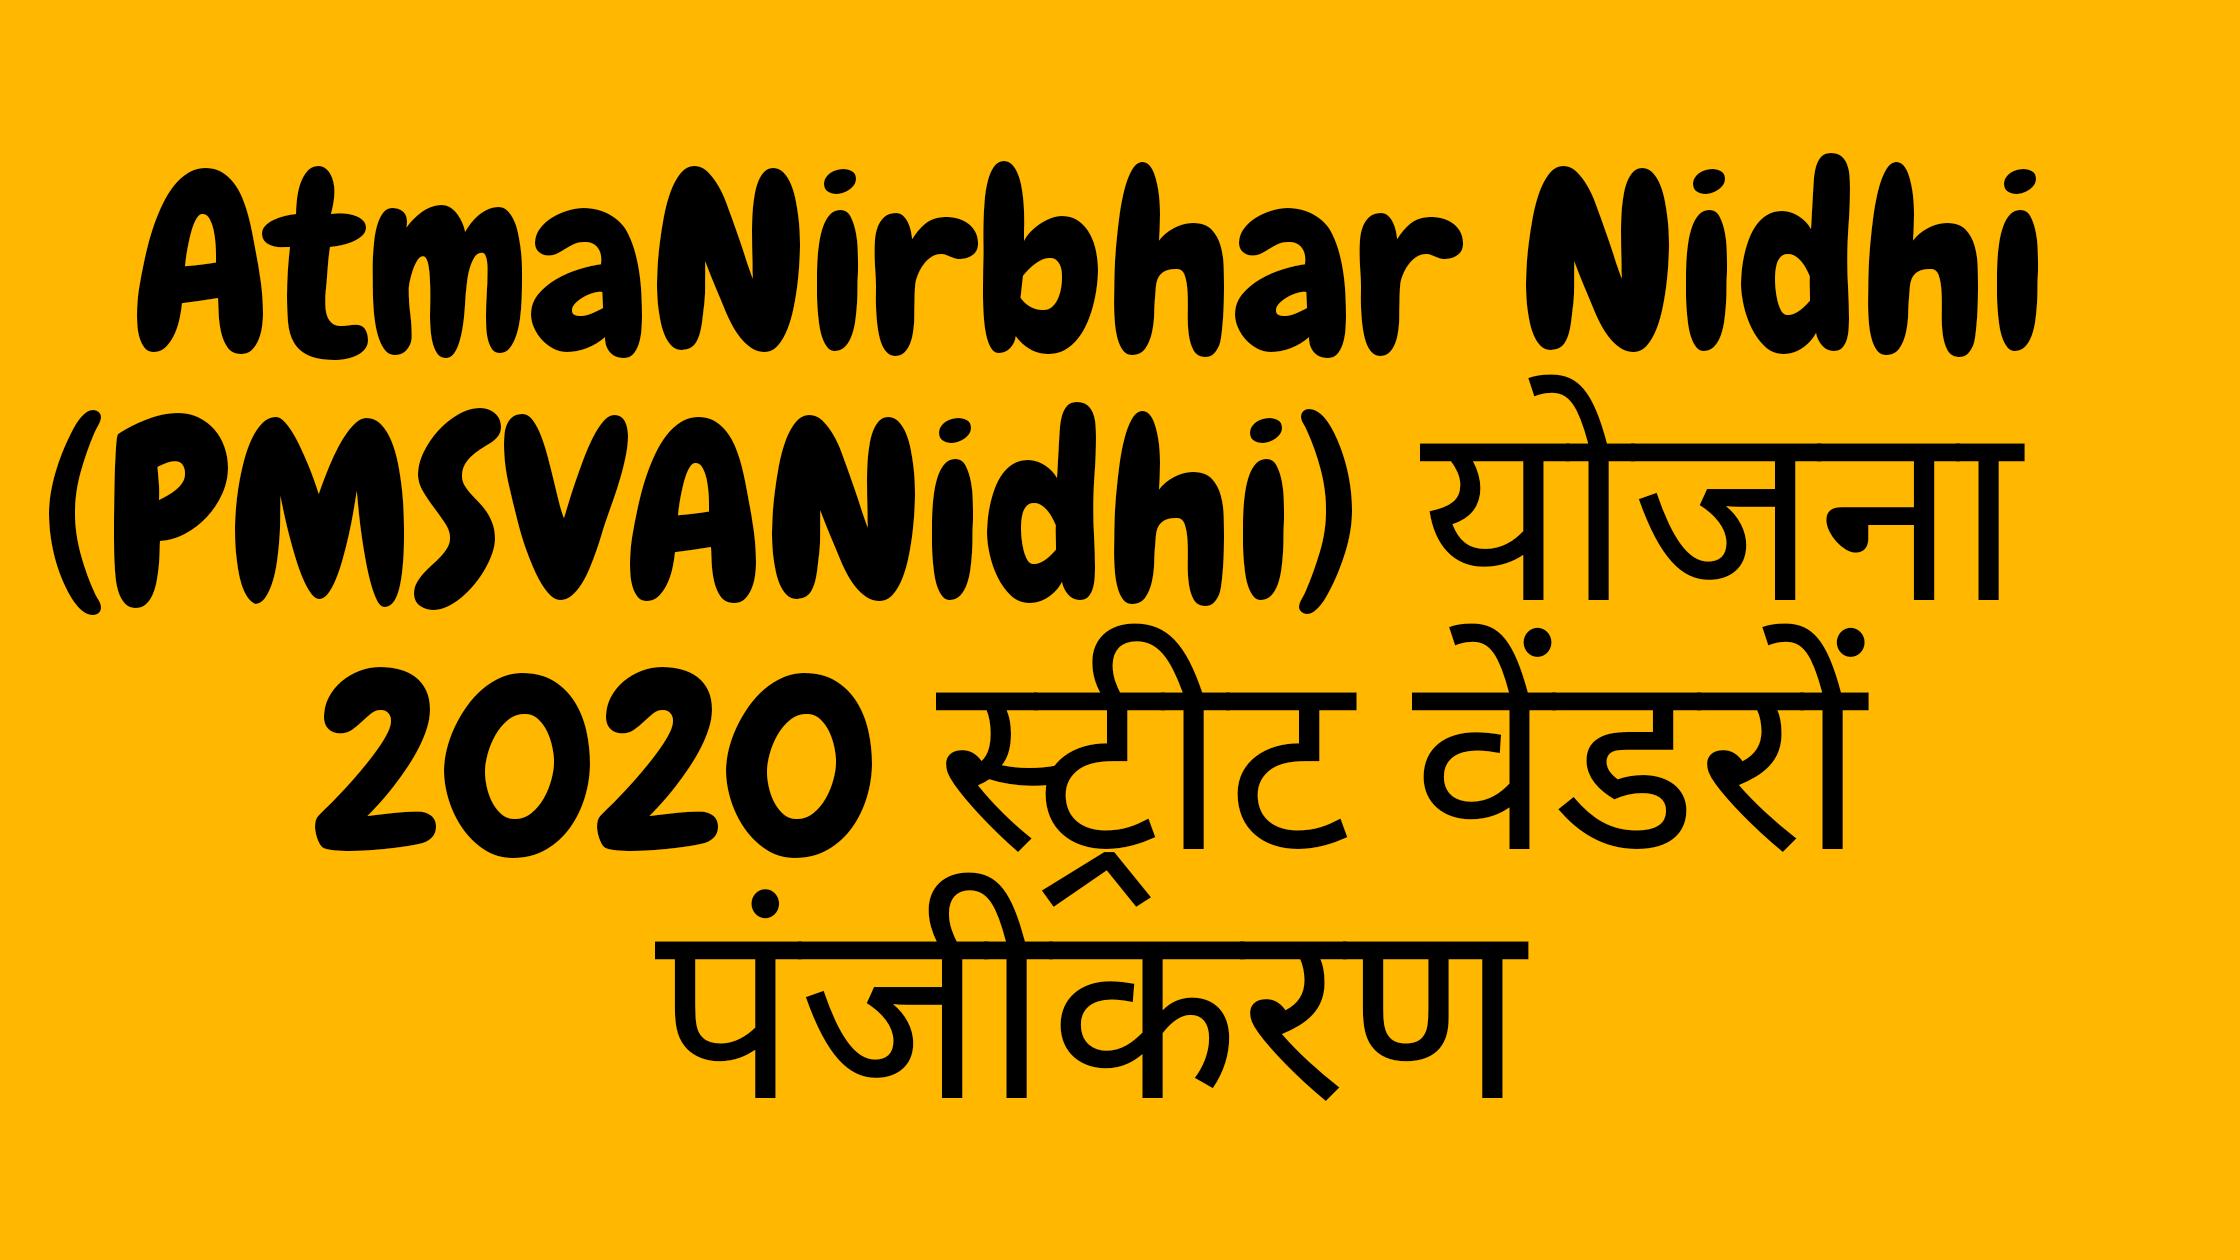 (ऑनलाइन आवेदन)PM SVANidhi योजना पंजीकरण कैसे करे